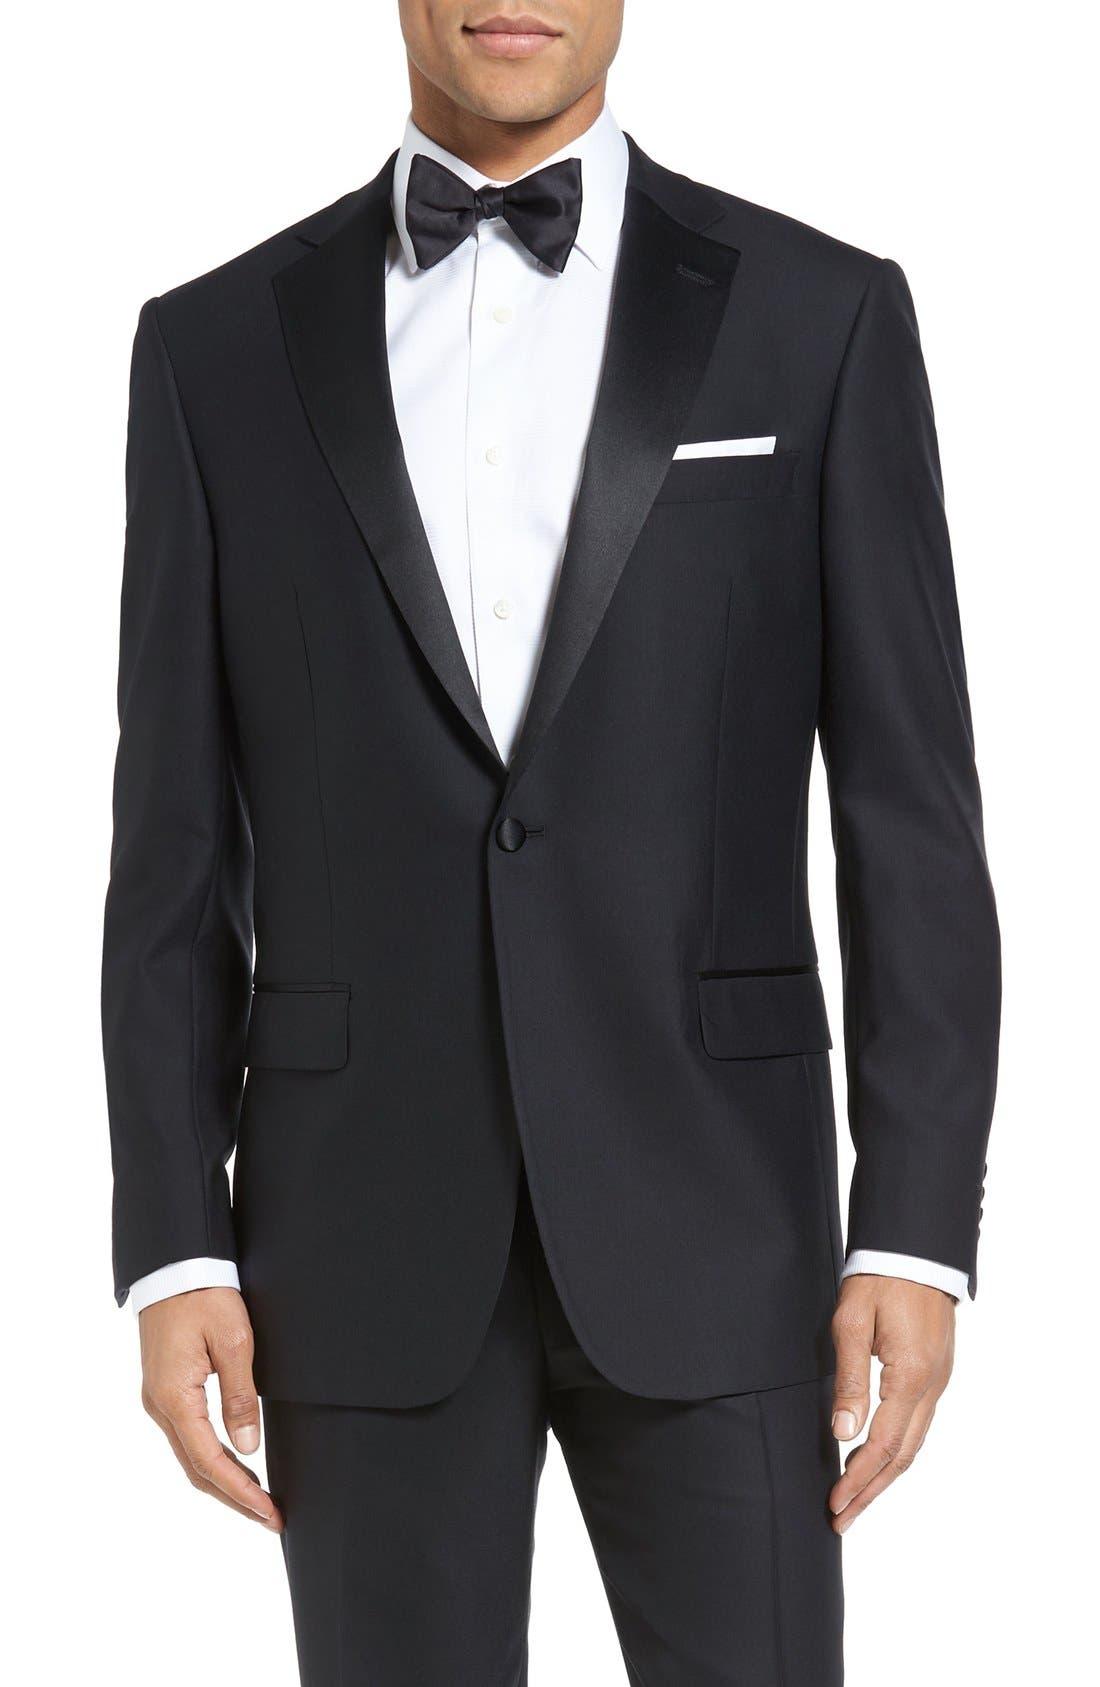 HART SCHAFFNER MARX, New York Classic Fit Black Wool Tuxedo, Alternate thumbnail 5, color, BLACK